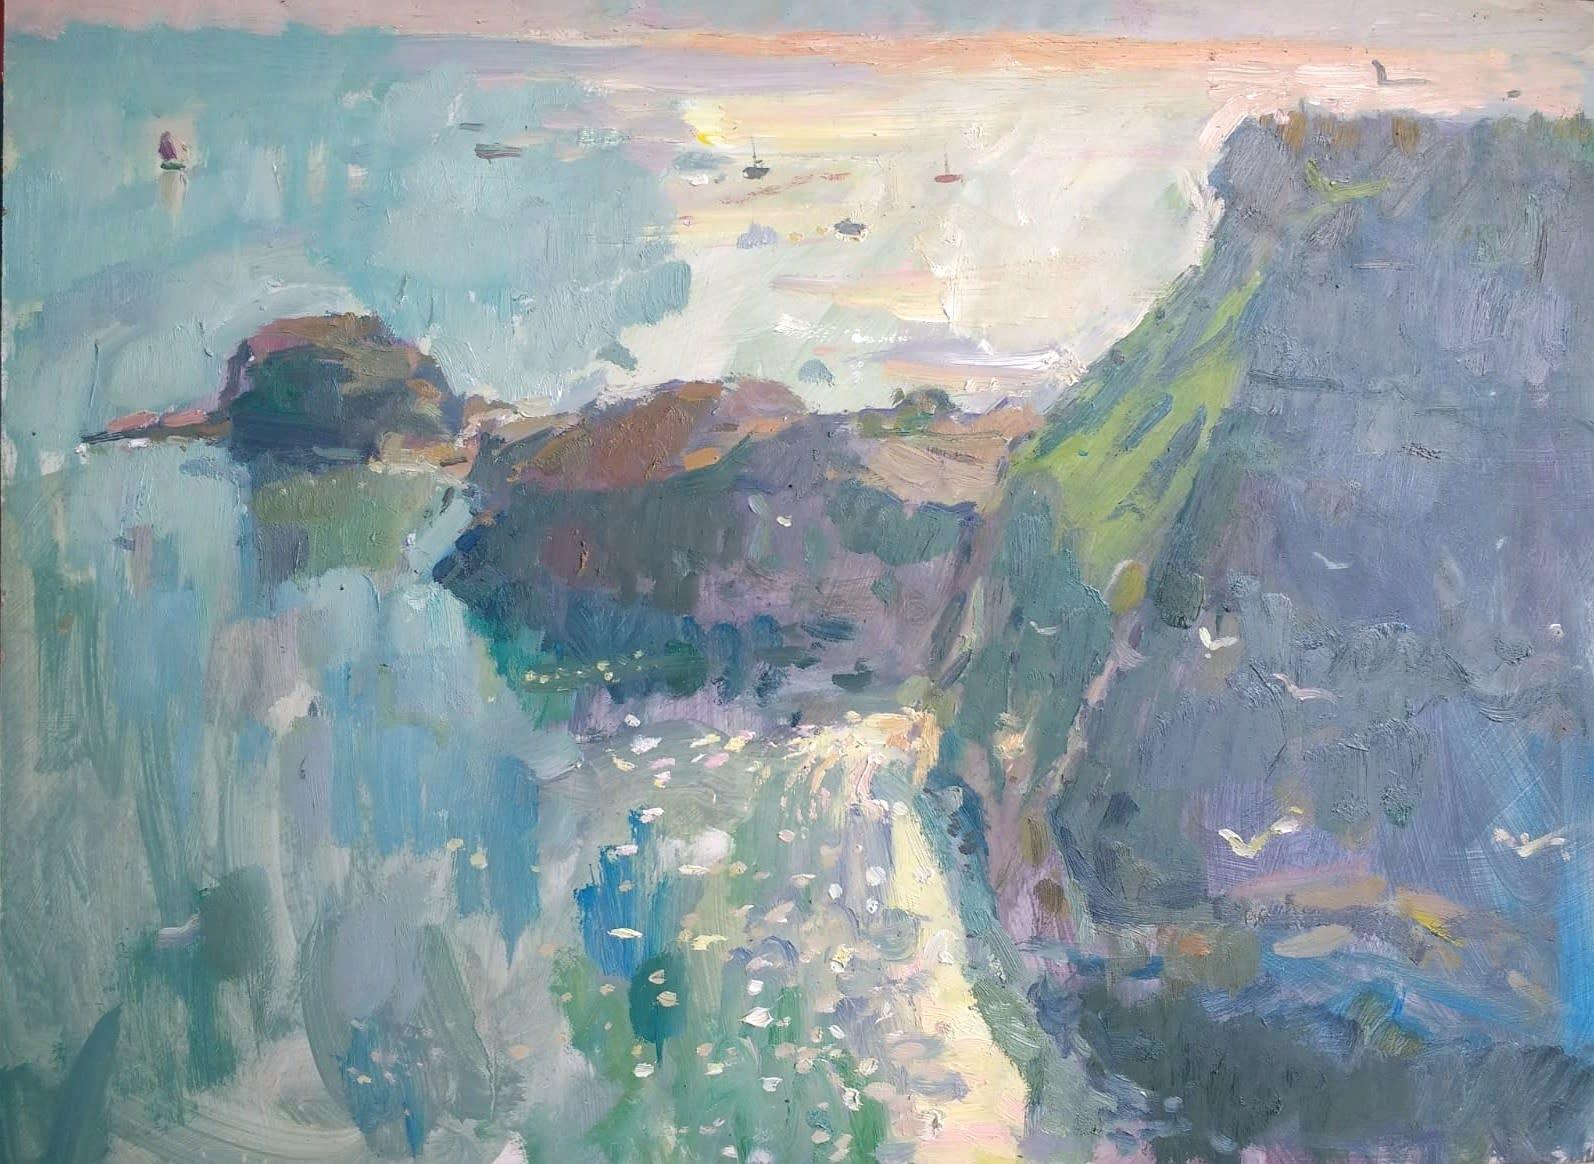 Andrew Farmer: Morning Light